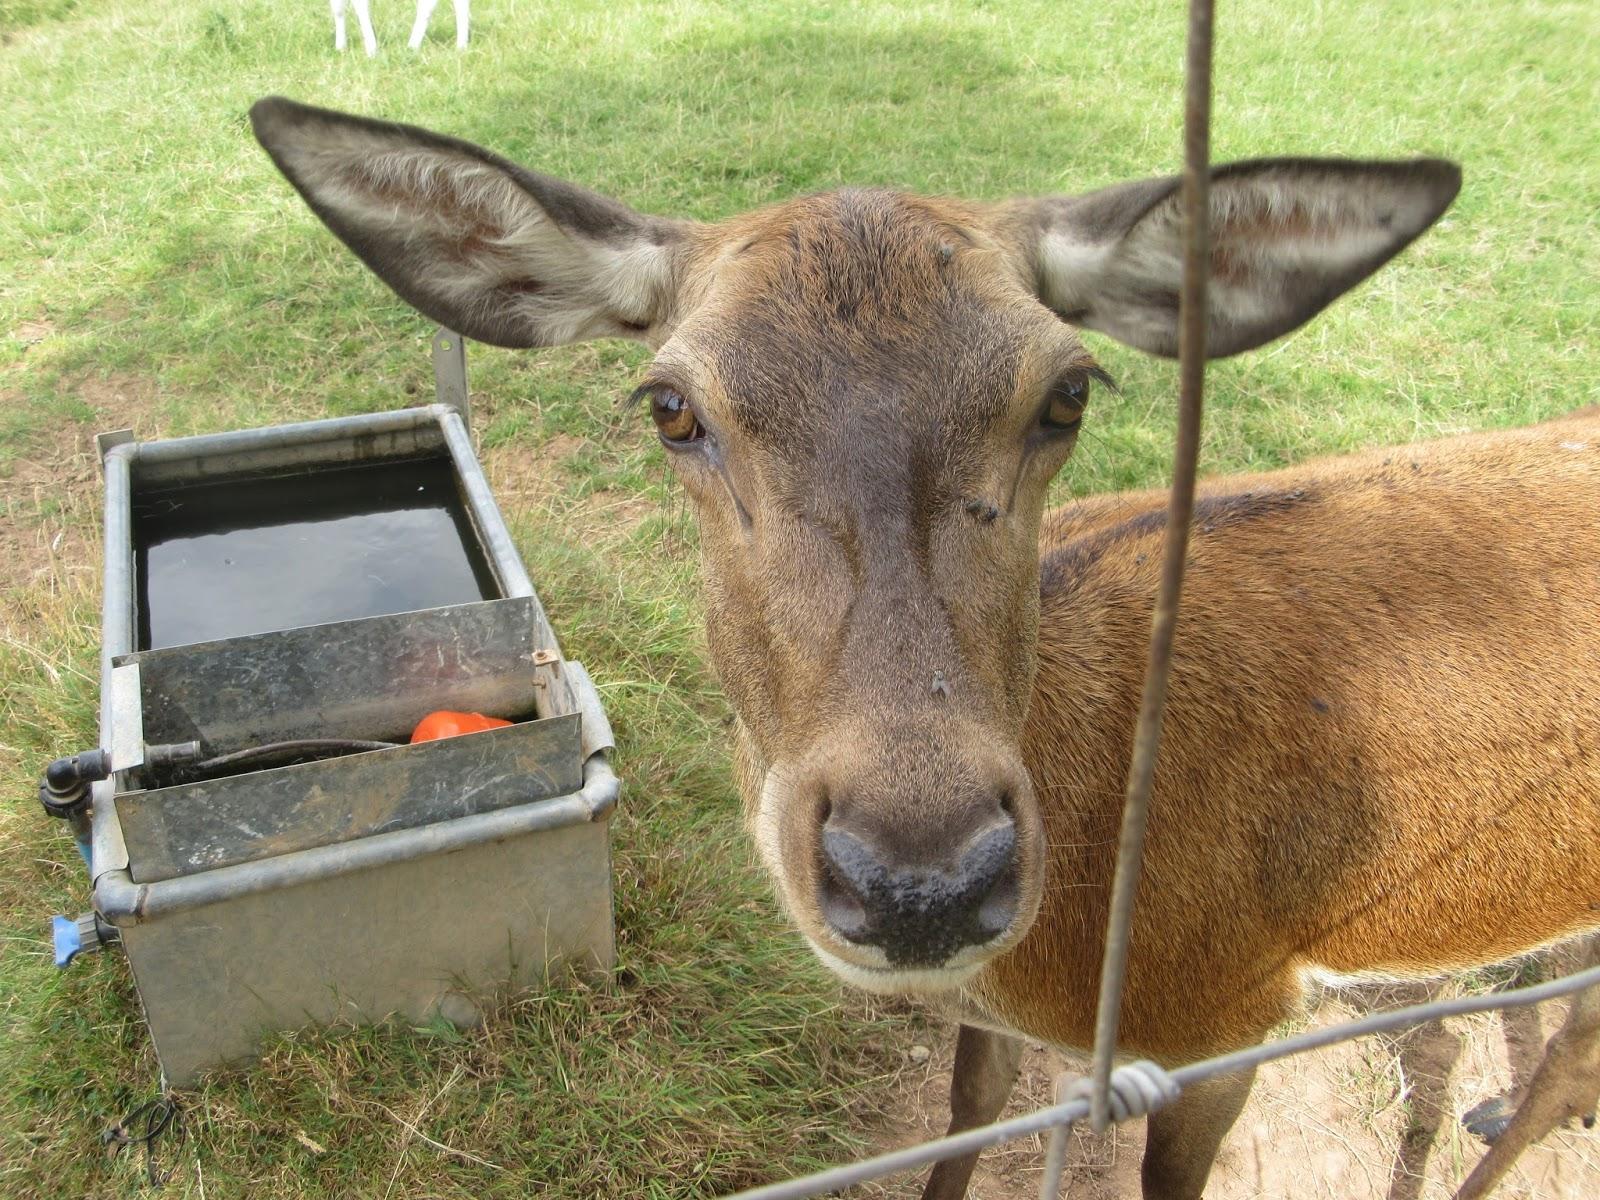 A close up of a red deer doe